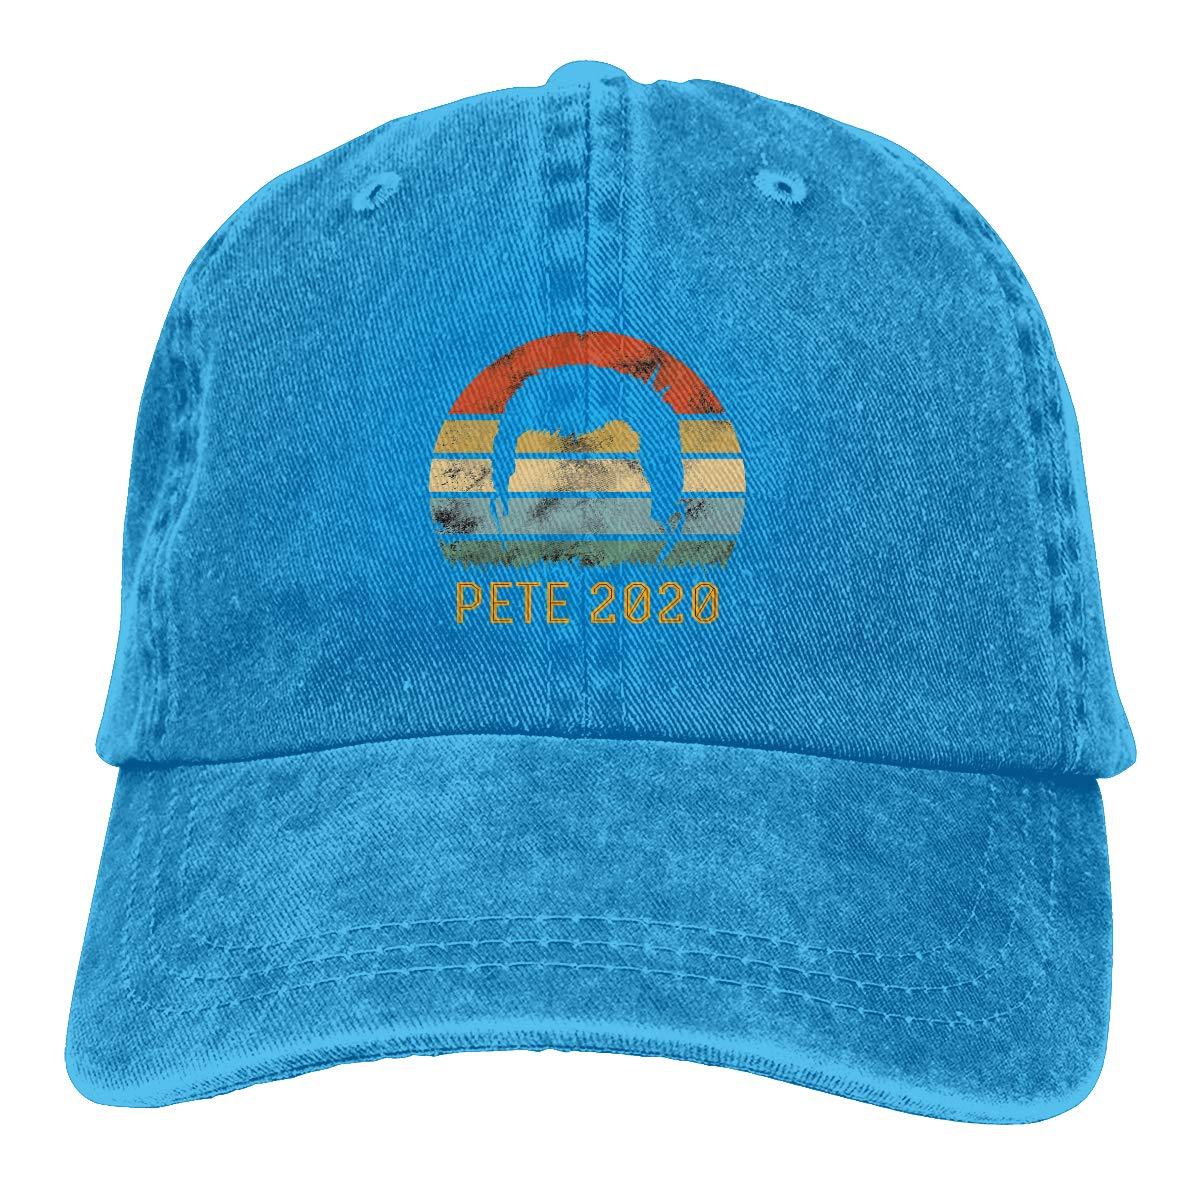 ORYISGAD Mayor Pete Buttigieg 2020 Sports Cap for Mens and Womens